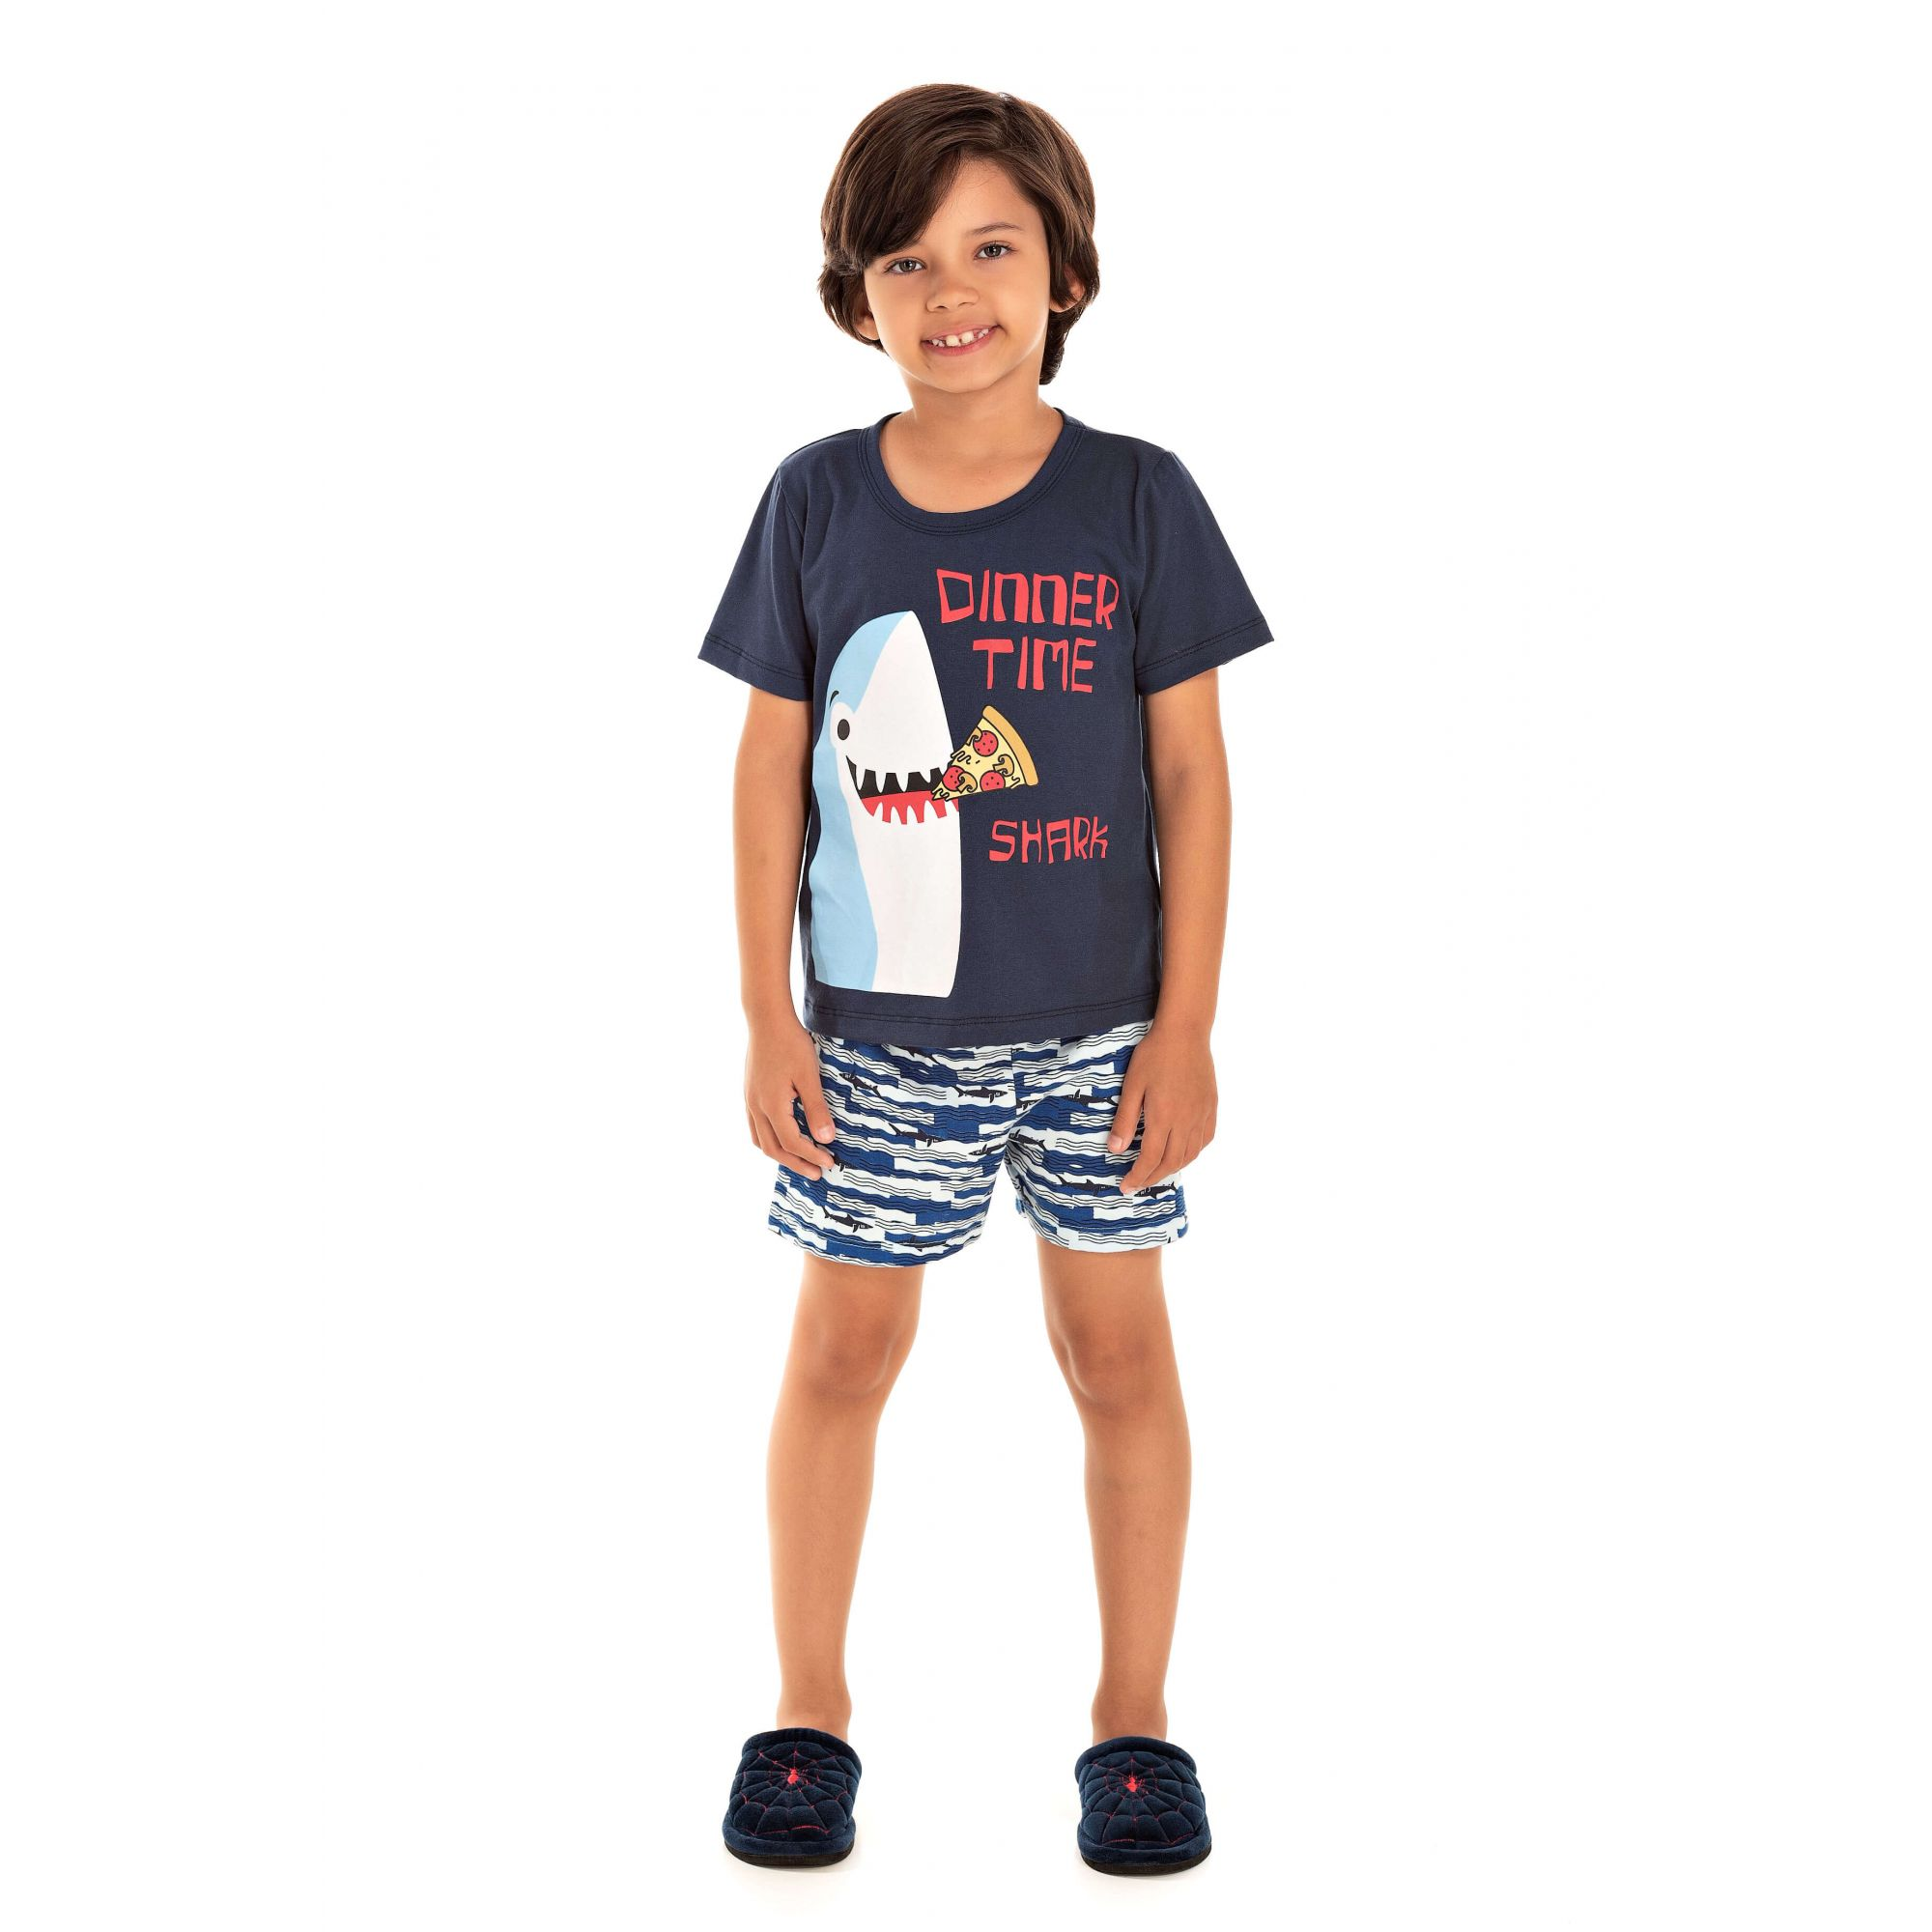 Pijama Infantil Masculino Dinner Time Shark - Marinho